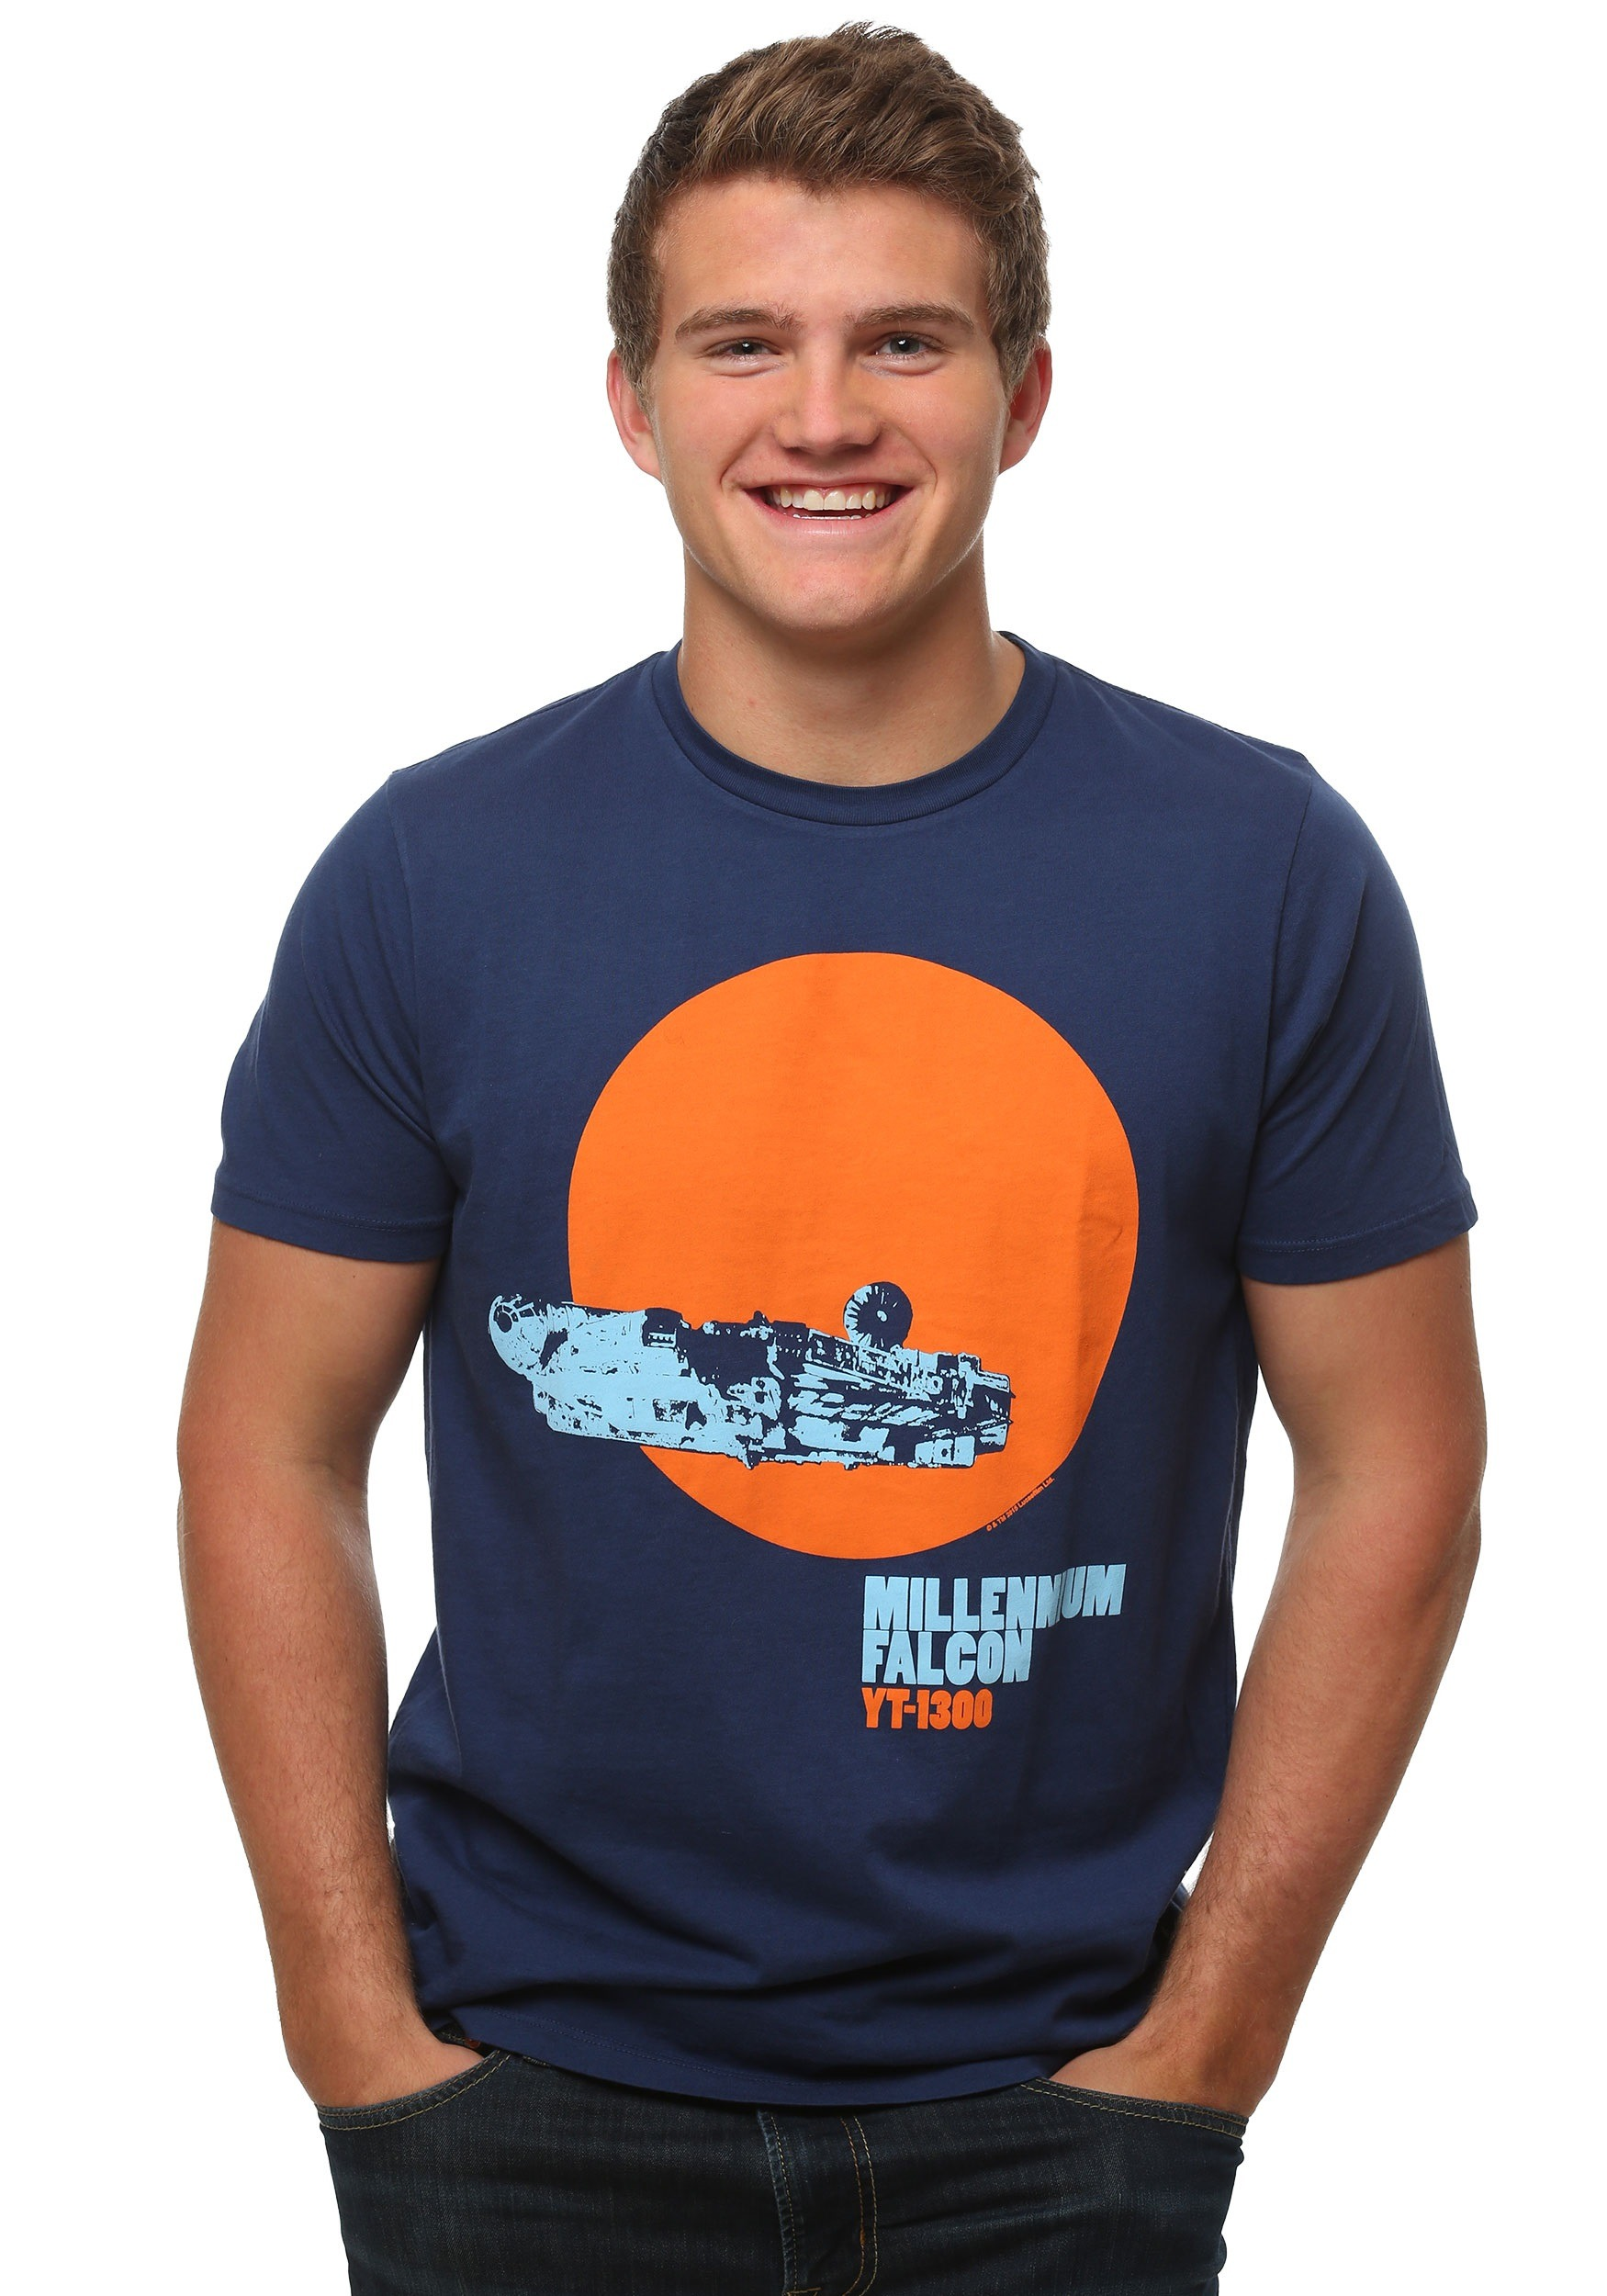 be00adc5 Mens Star Wars Millennium Falcon T Shirt Blue | Toffee Art